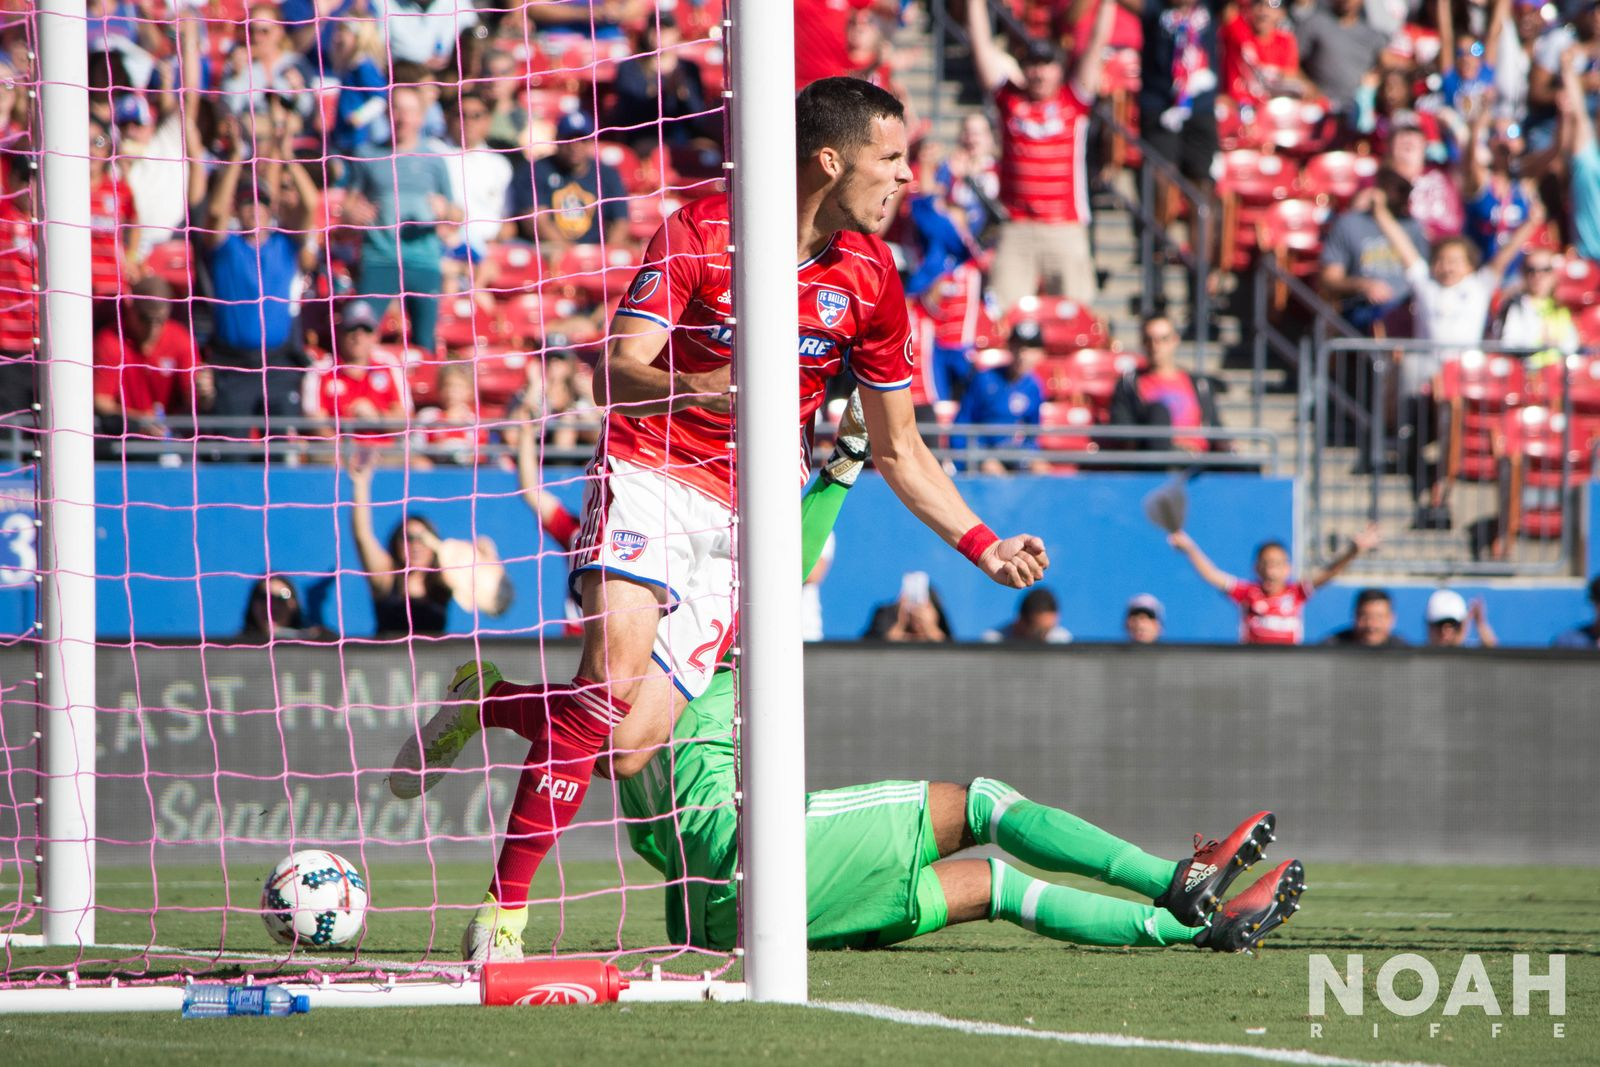 FC Dallas vs. LA Galaxy: Match Photos - By: Noah Riffe